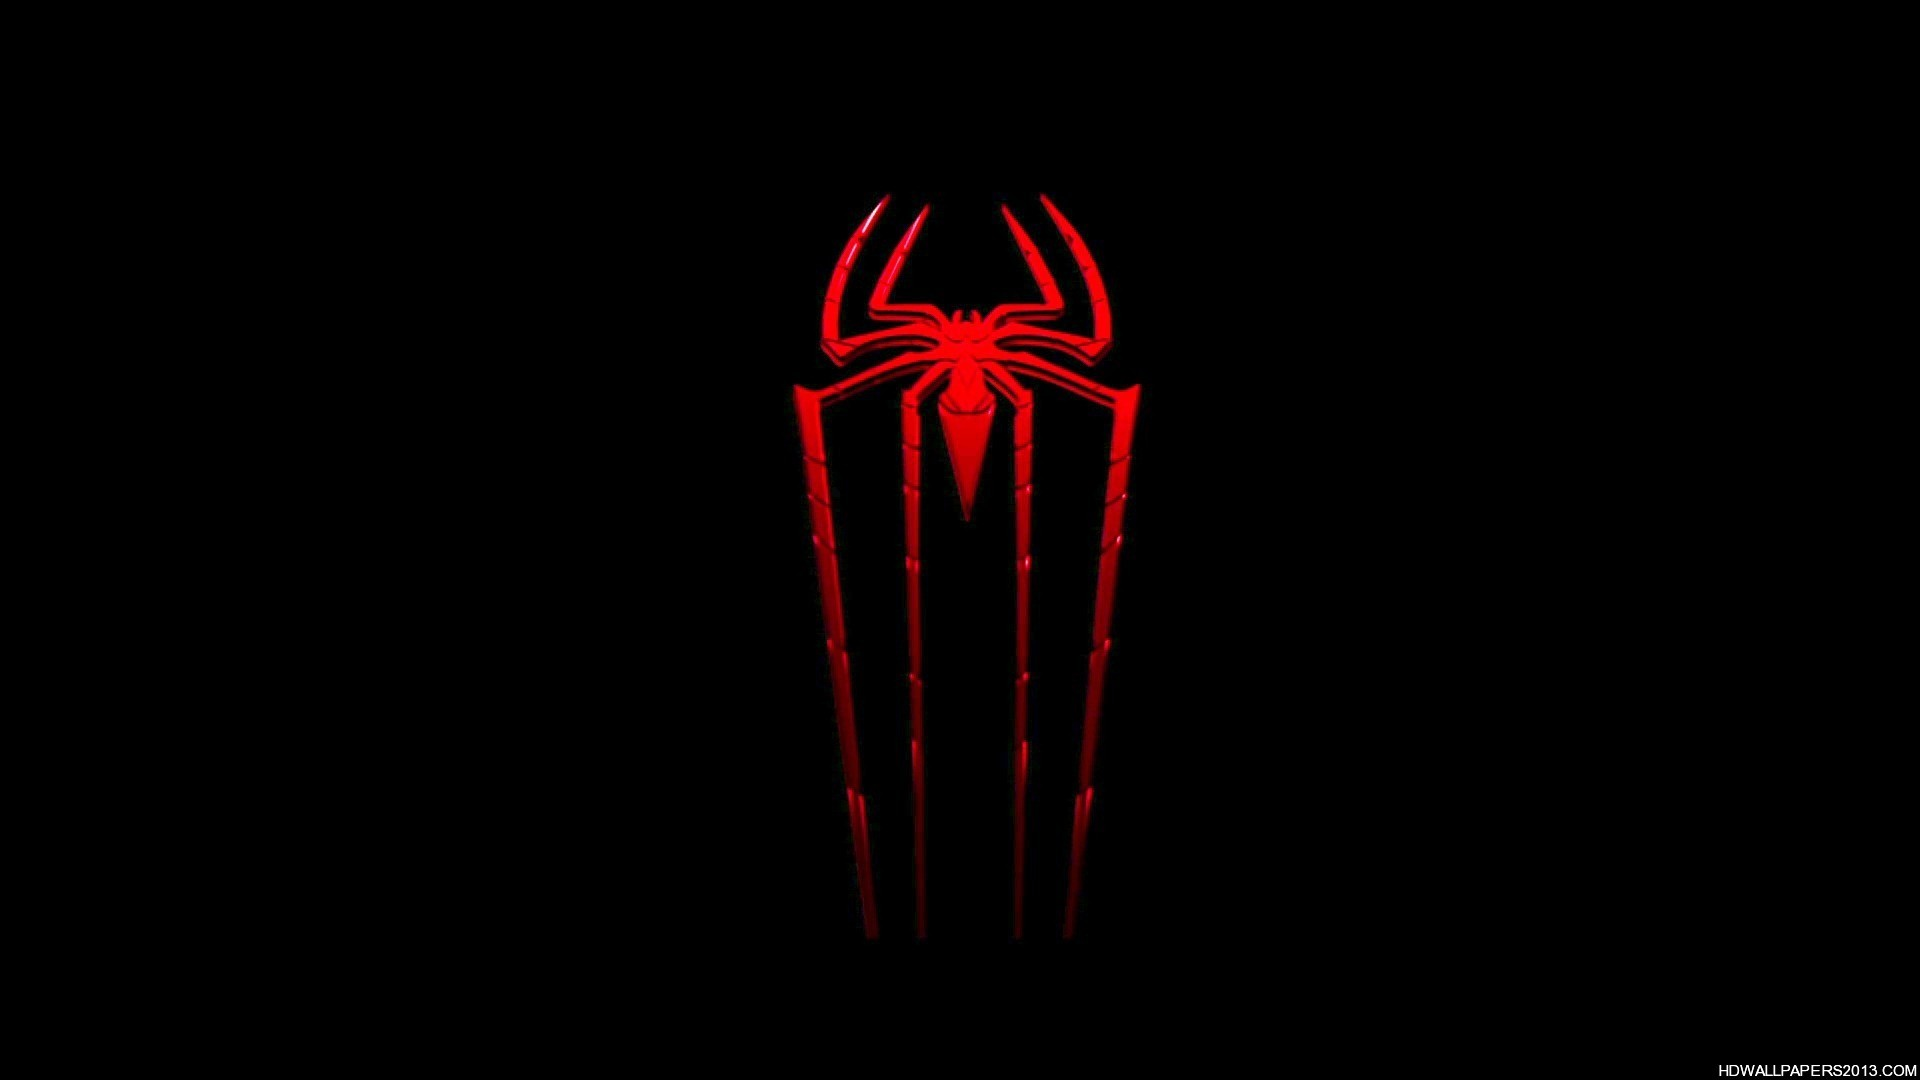 The Amazing Spider Man Logos